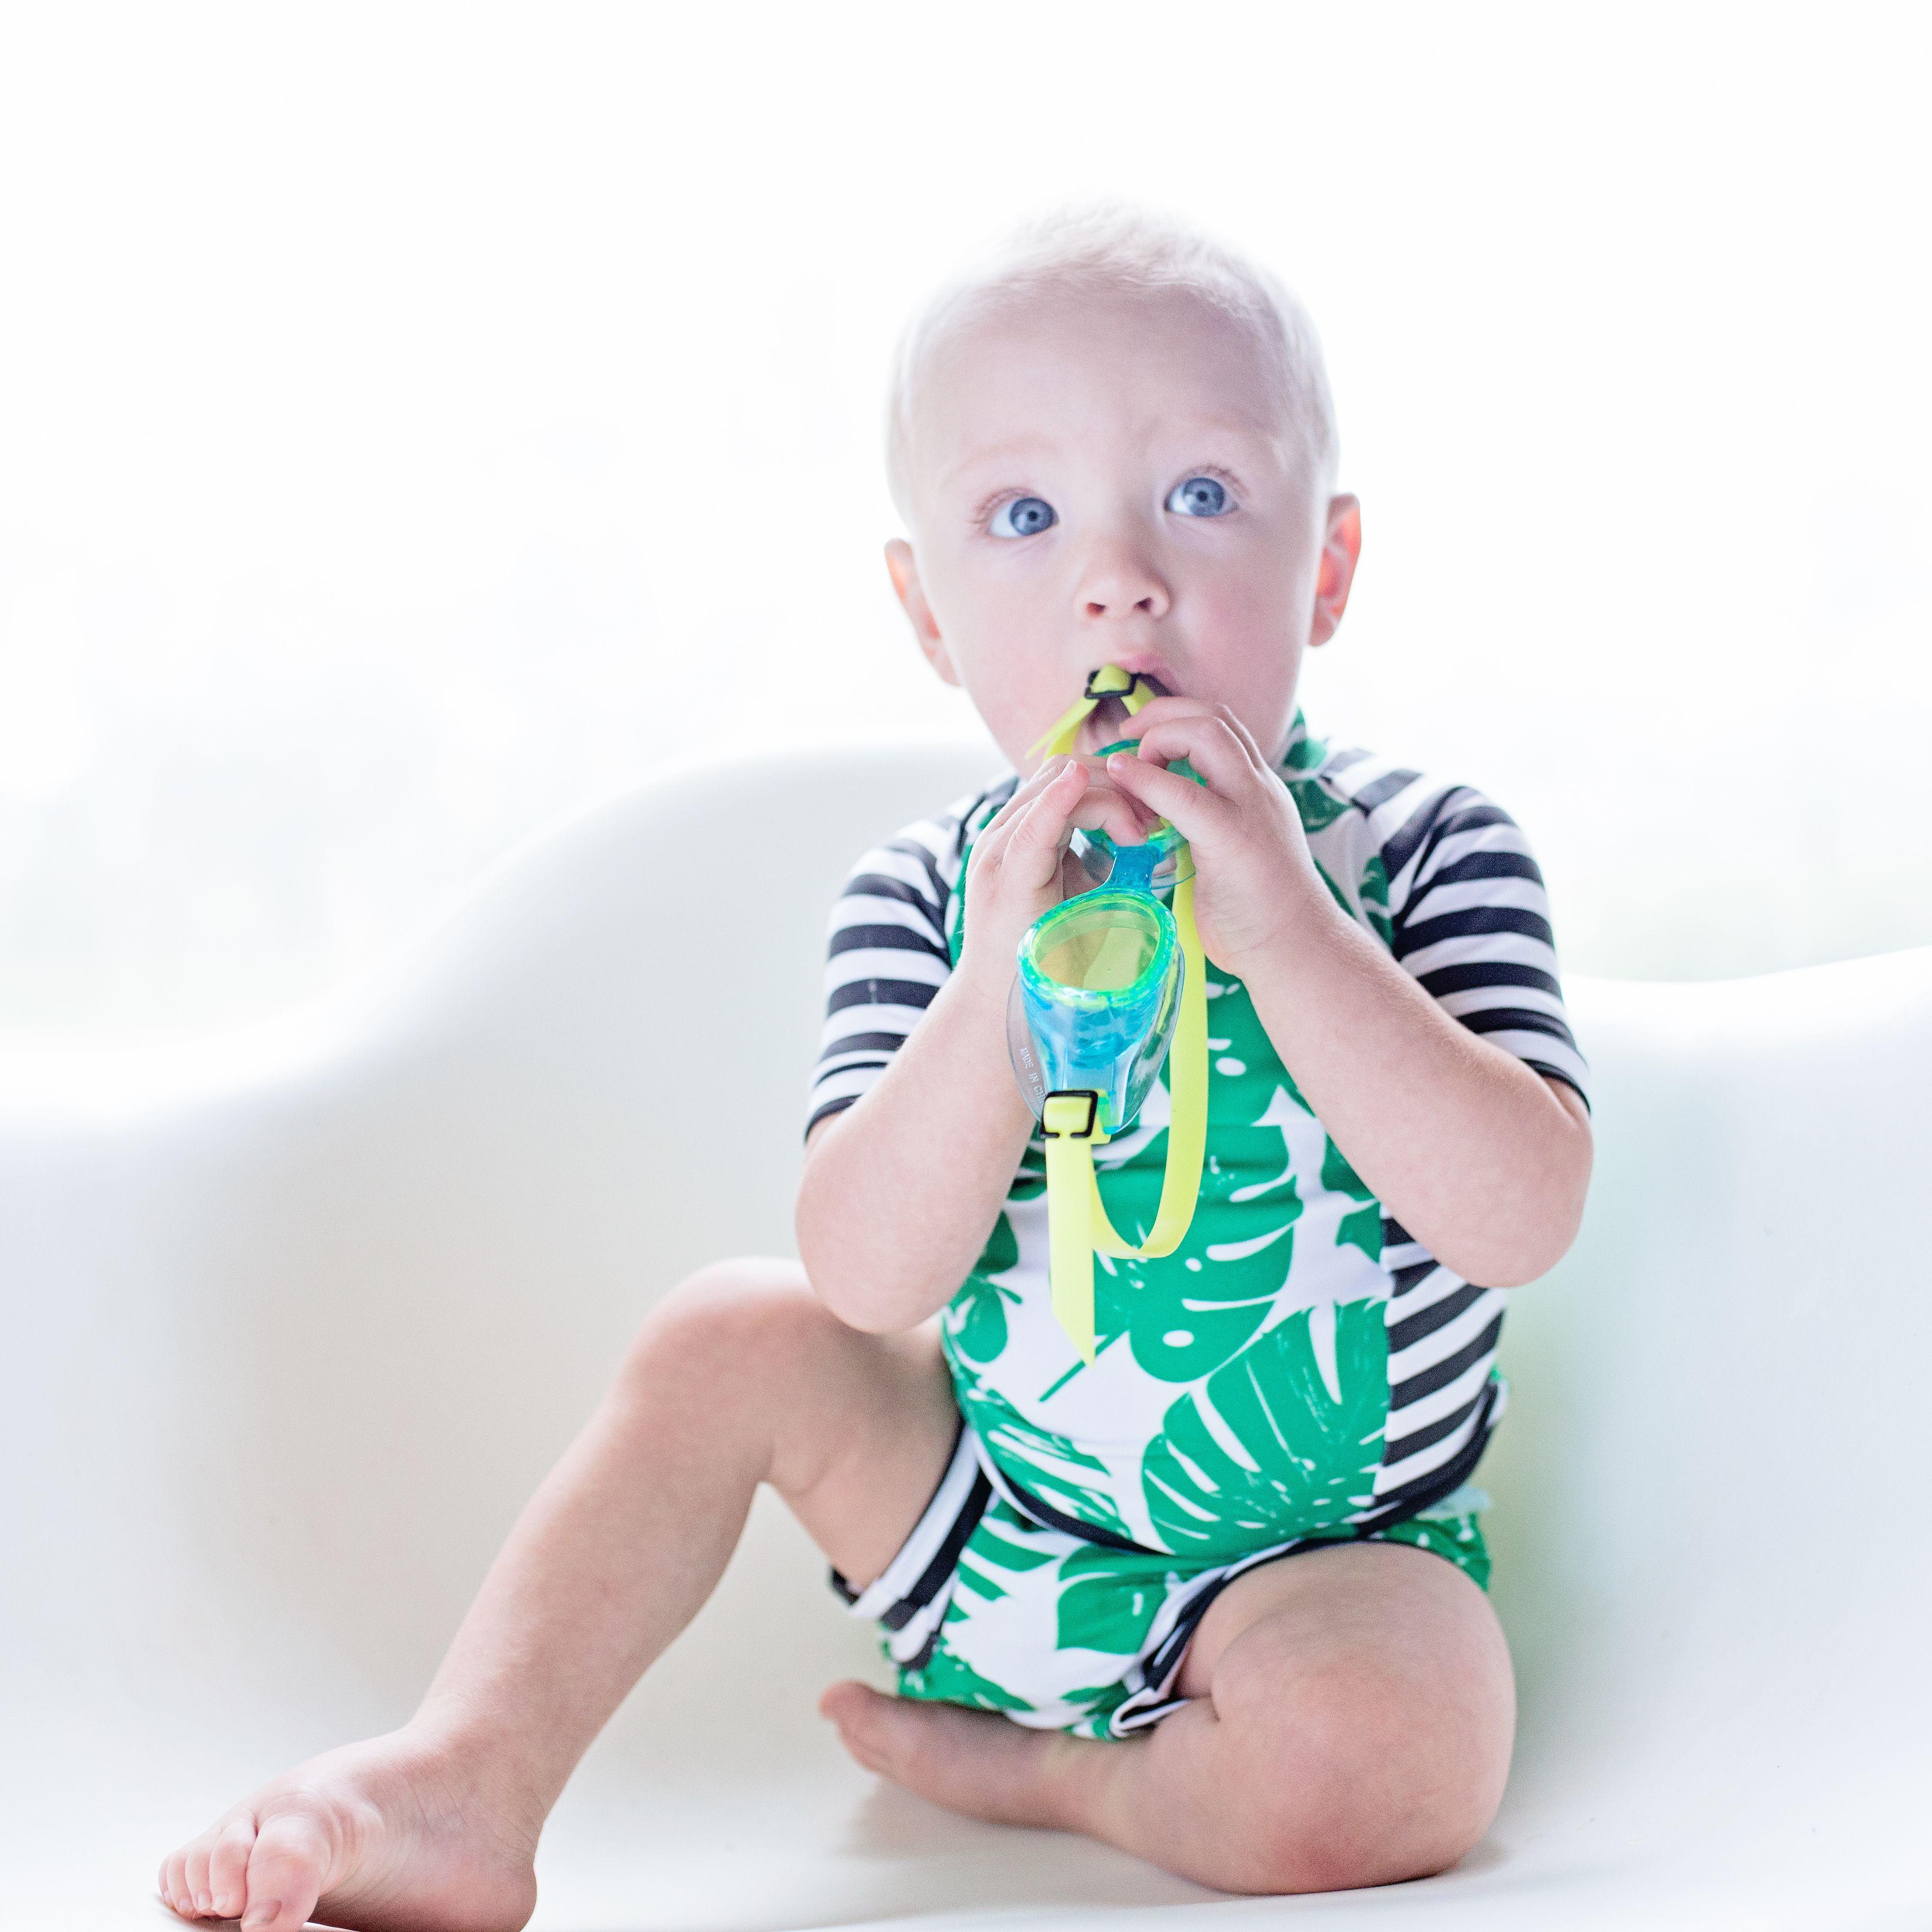 cb4acd6a5b Cutest Baby Swim Suit Ever! Monstera Rash Guard. Baby Rash guard, Baby Euro  Swimsuit, Baby Speedo. Wonderjet. Tropical Swimsuit. Toddler Swimsuit.